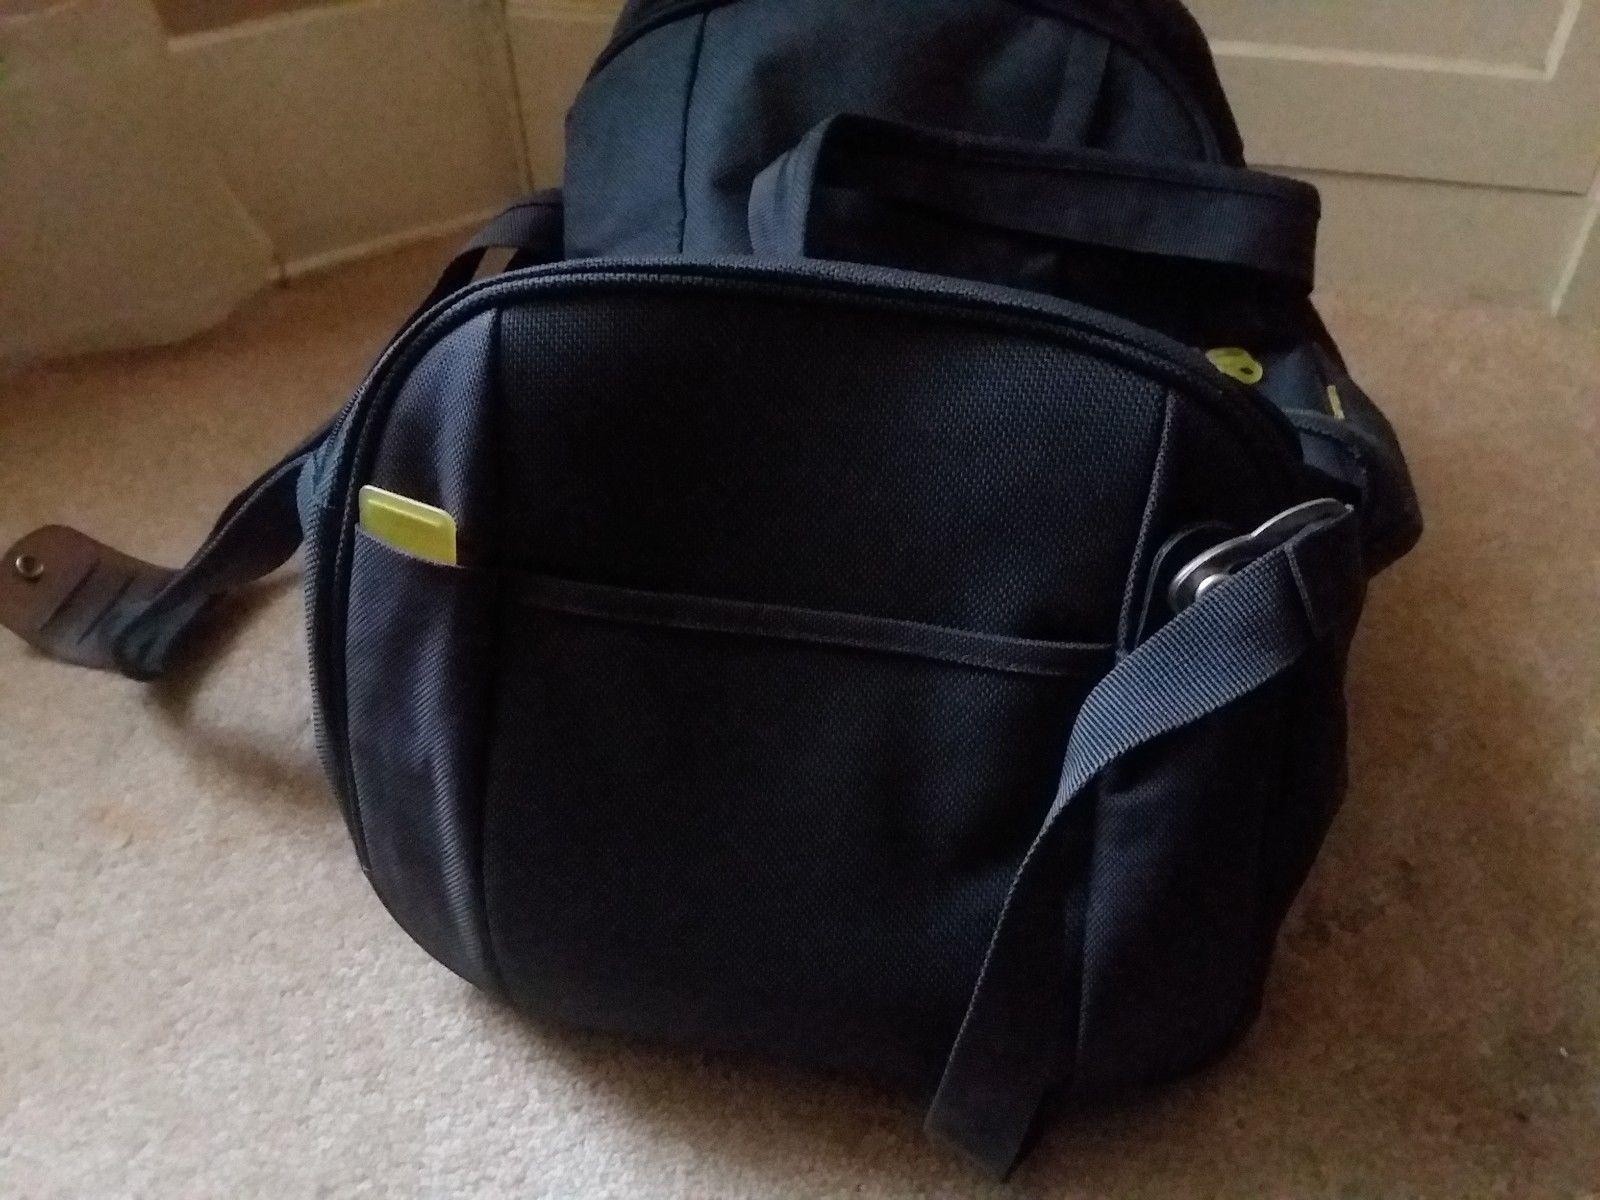 Samsonite Gray Yellow Travel Case Duffel Luggage image 4